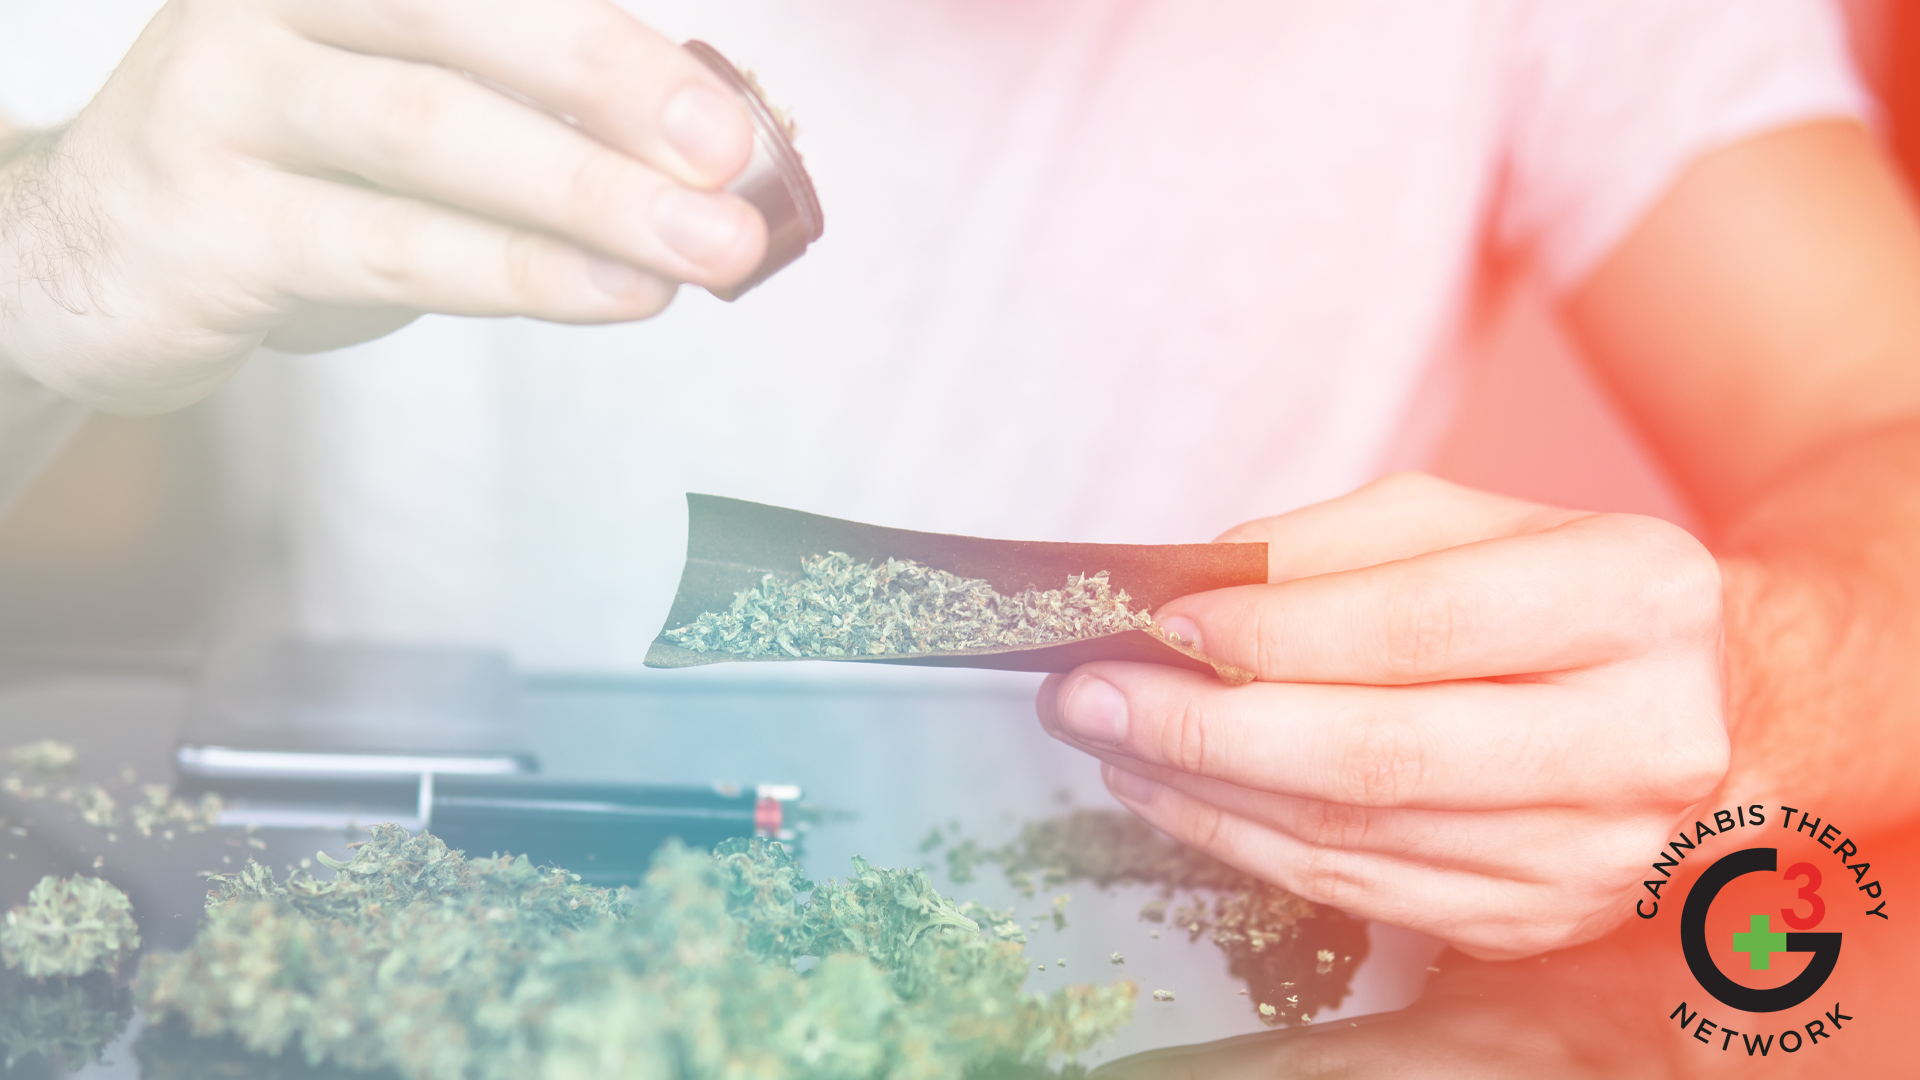 Man rolling a marijuana joint